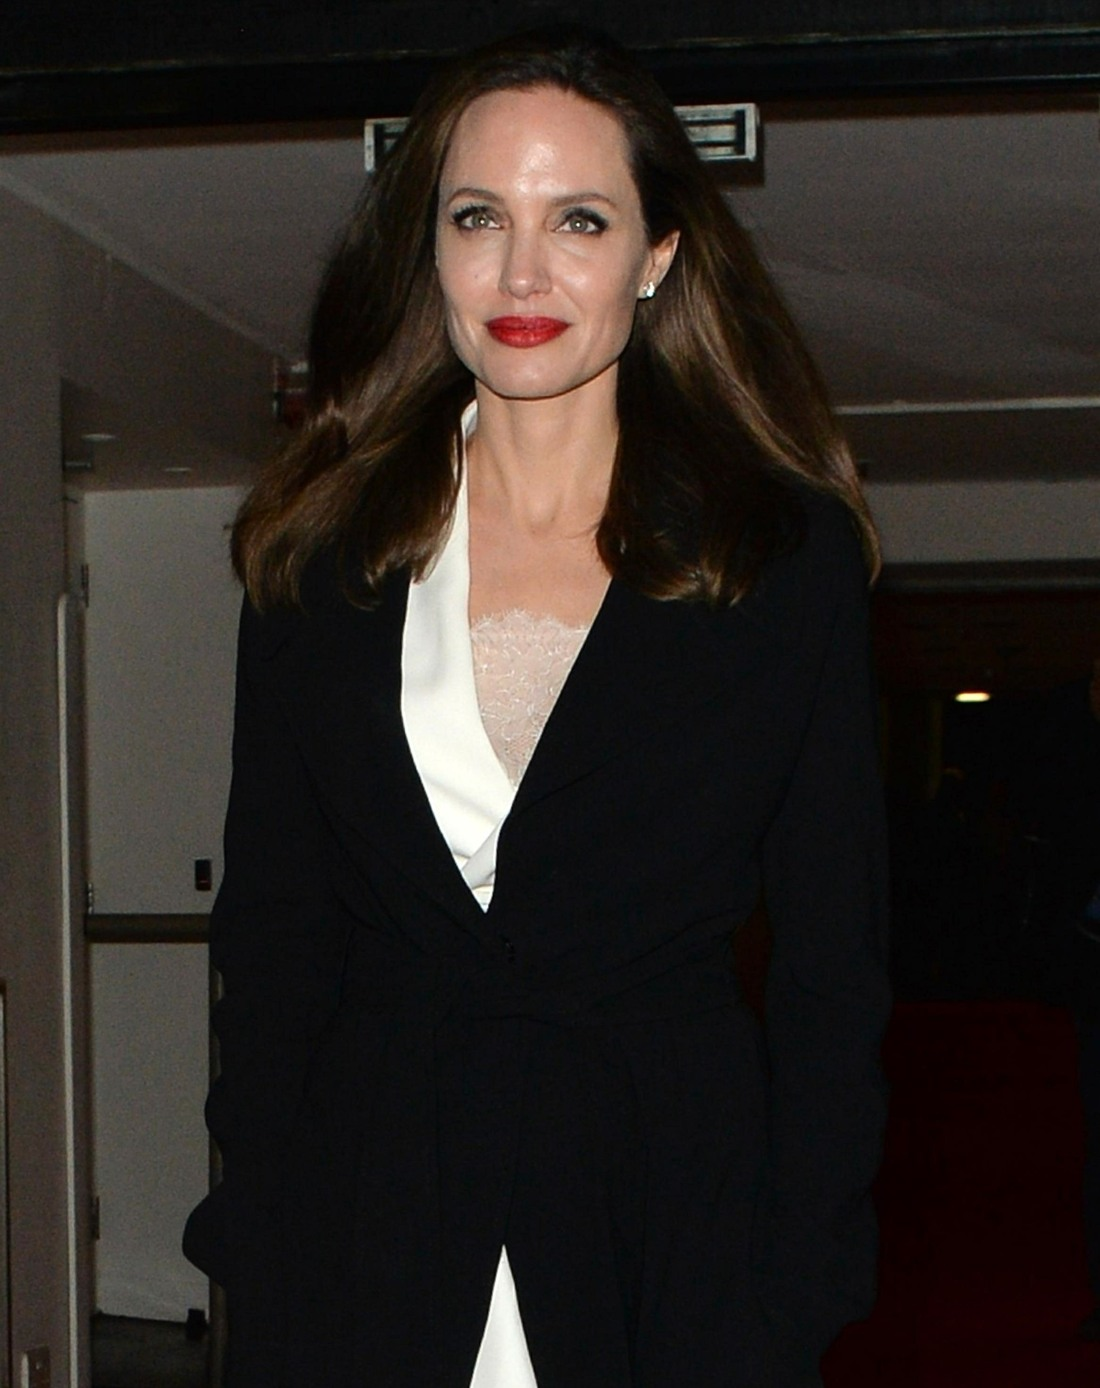 Angelina Jolie exits the 'Fighting Stigma Through Film Festival' in London